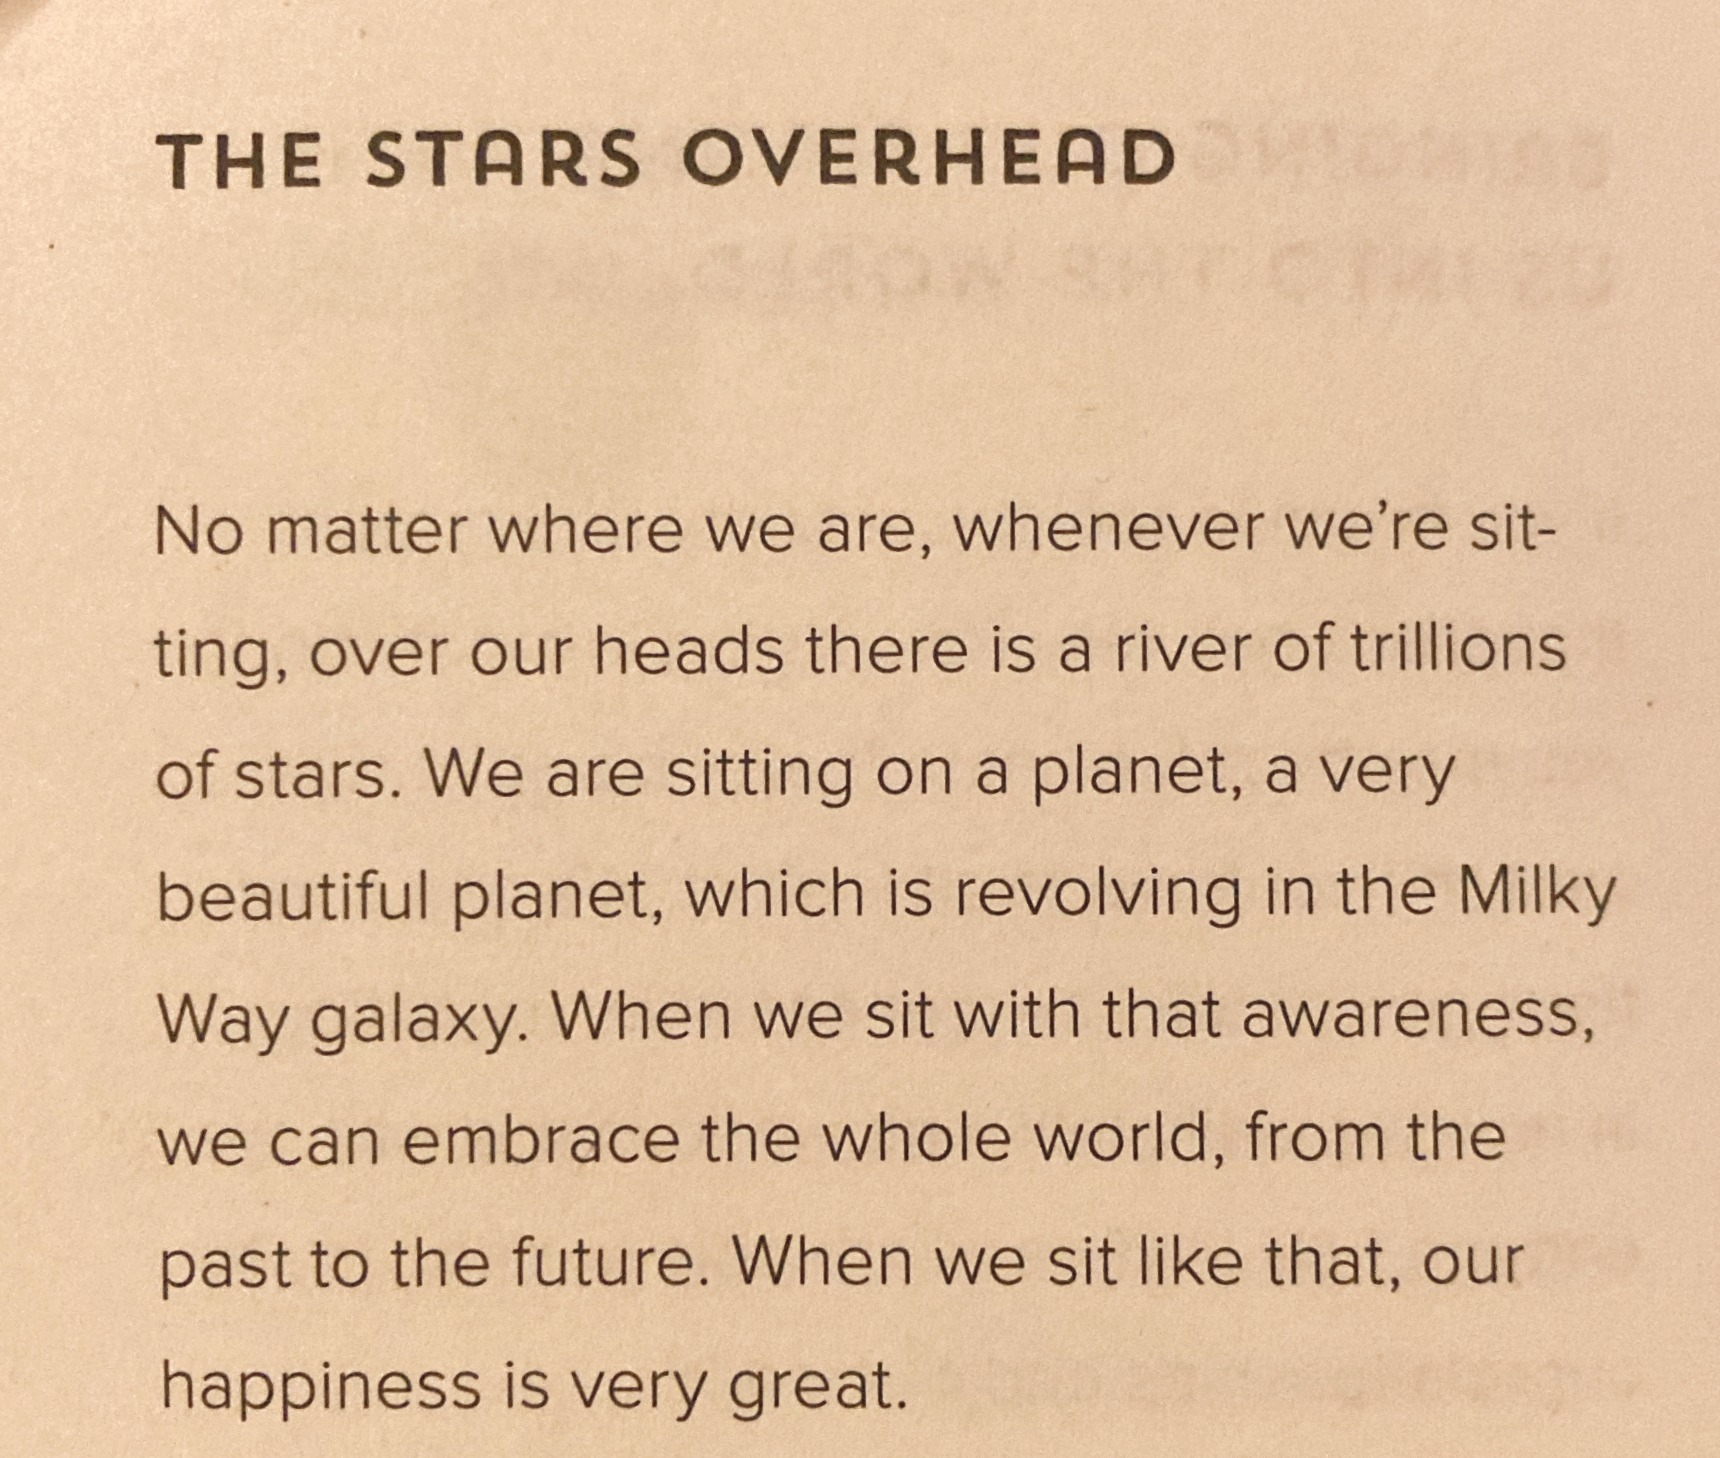 The Stars Overhead